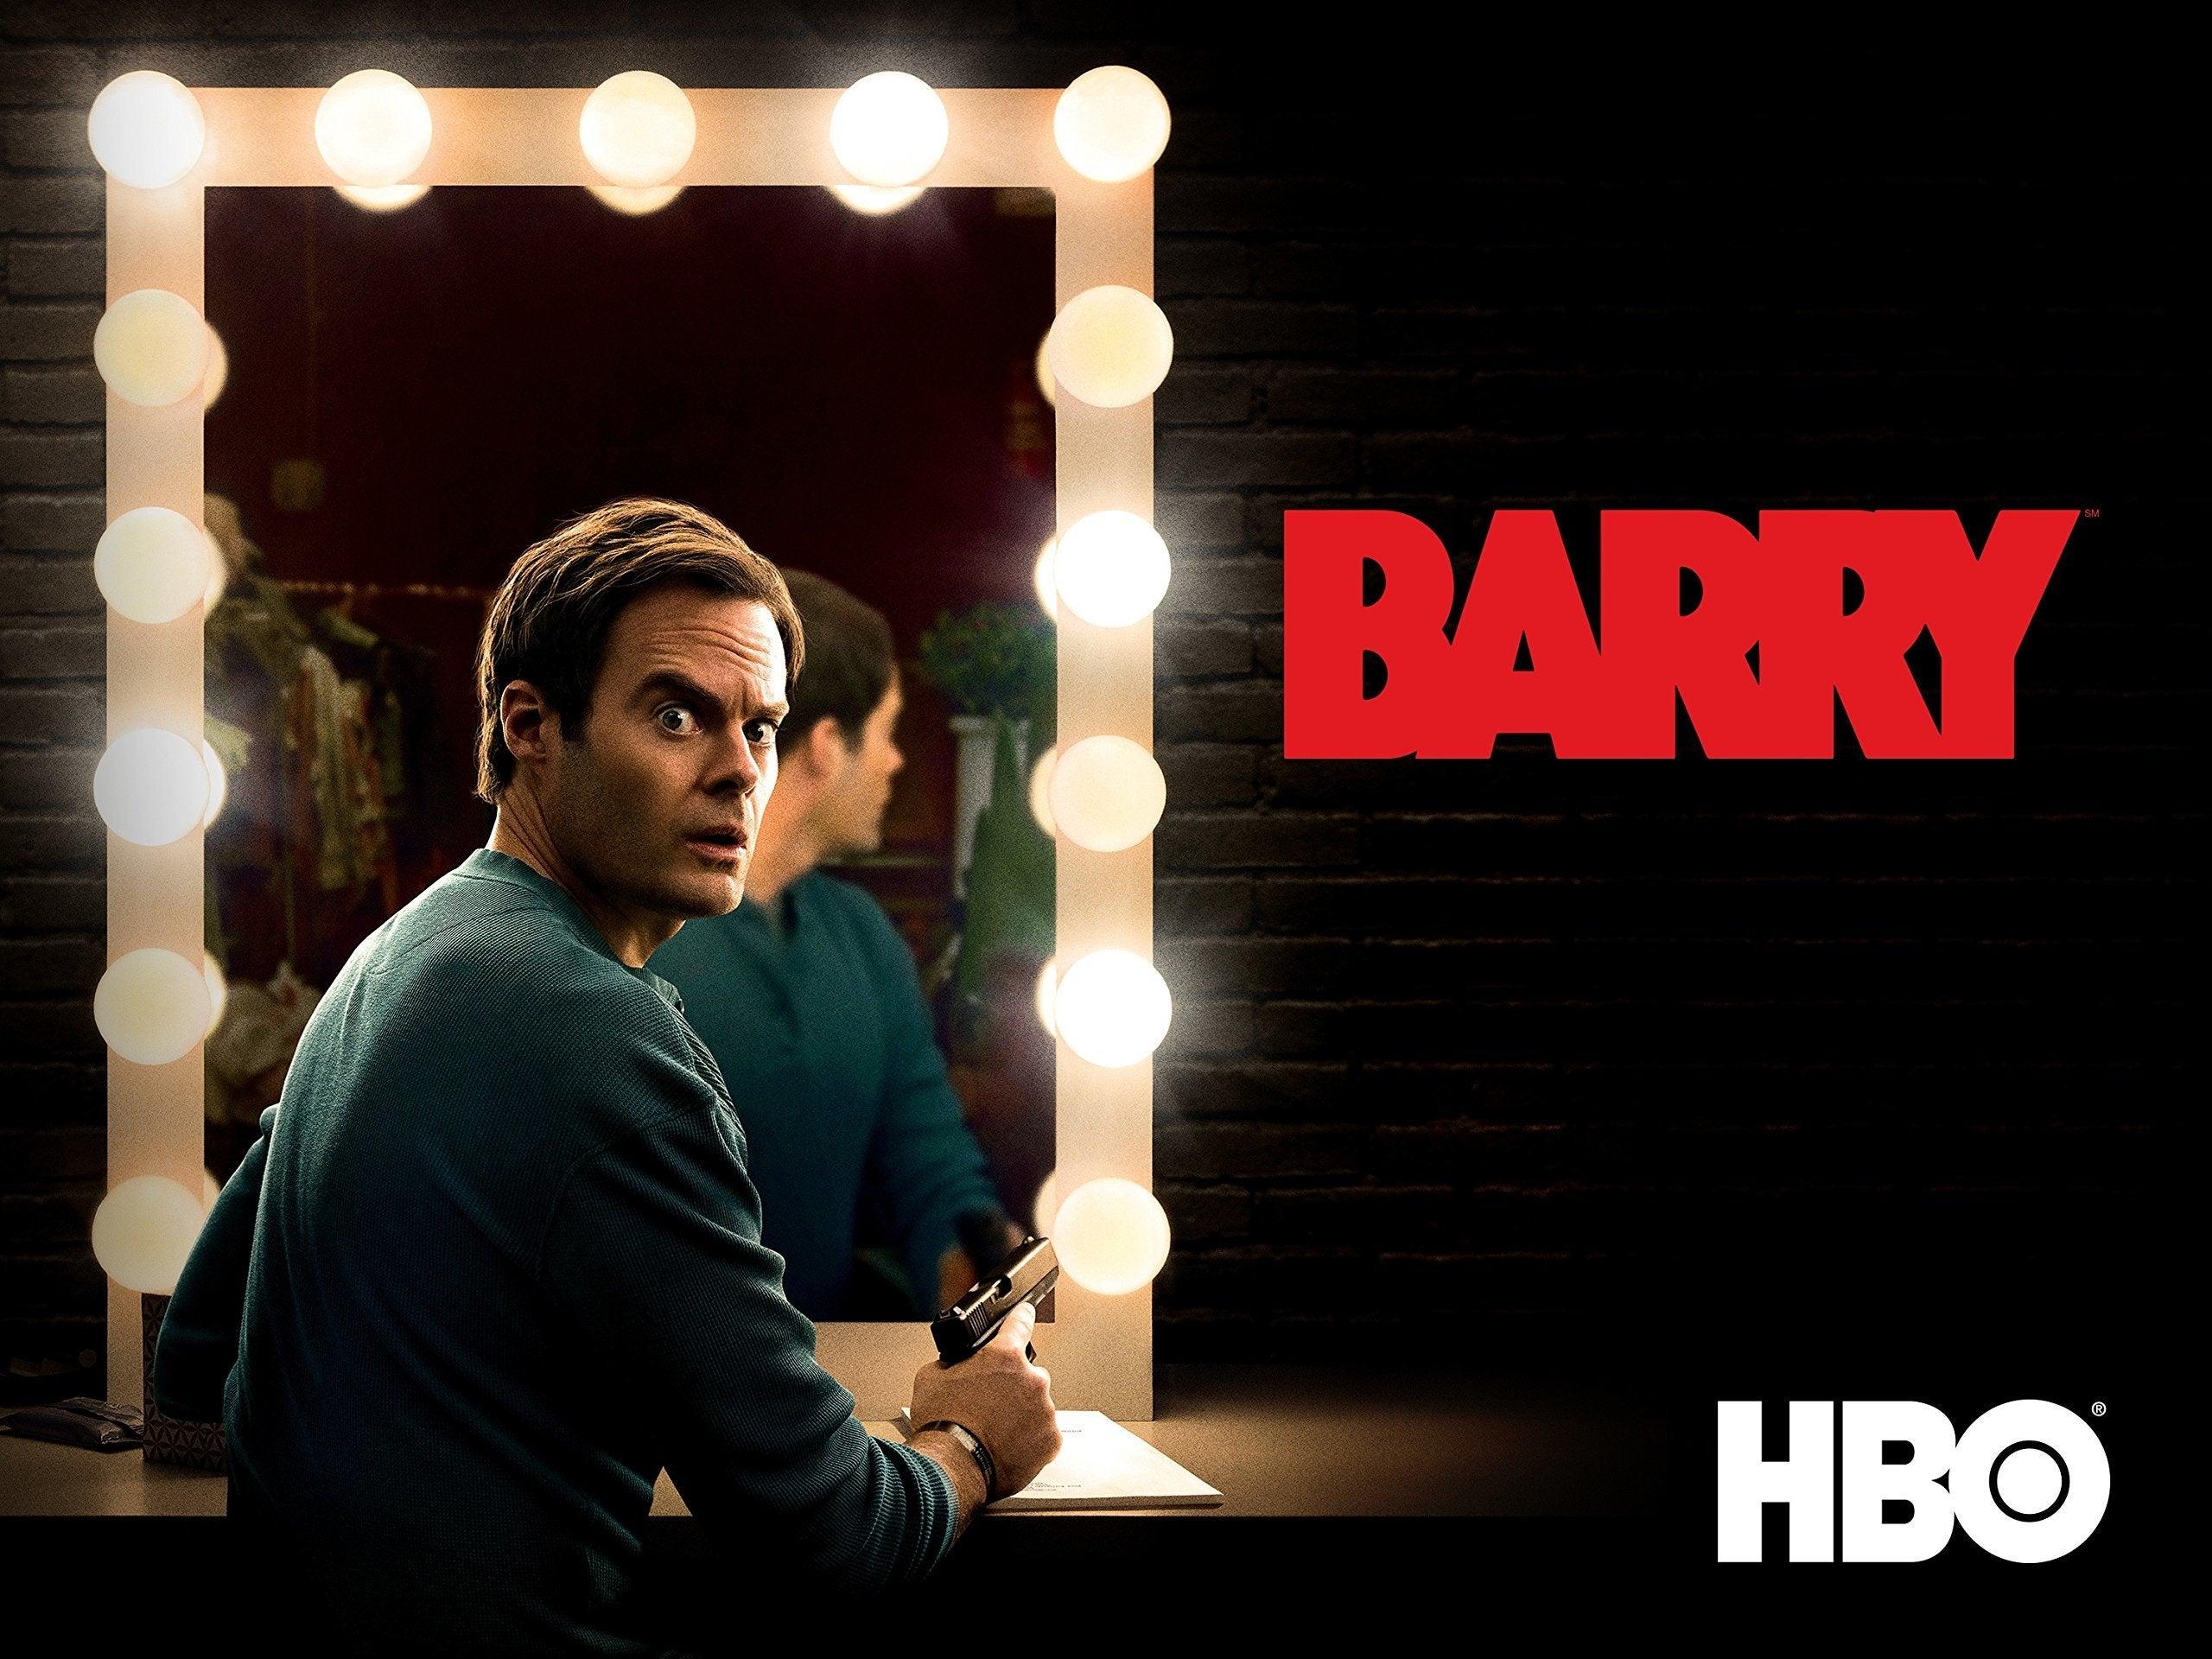 Marvel leak reveals title design for 'Hawkeye' TV series